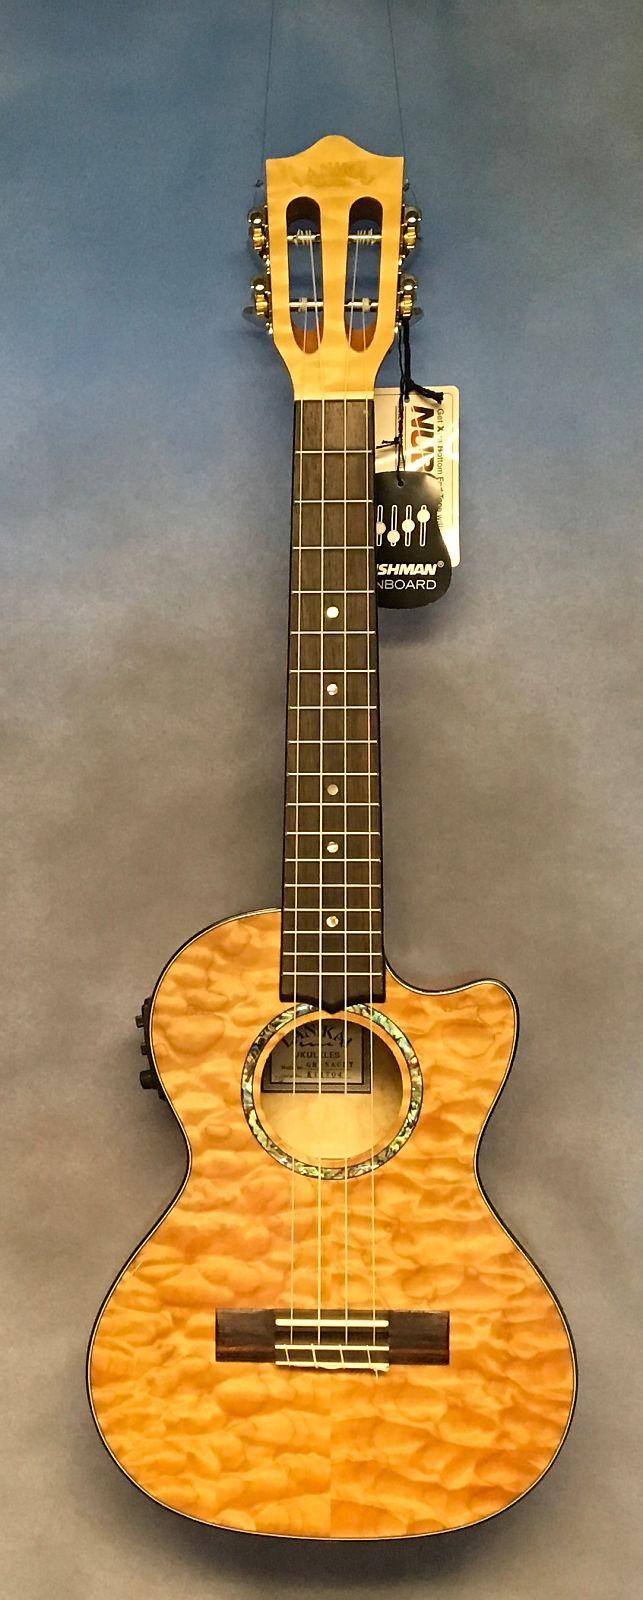 lanikai qm nacet quilted maple tenor ukulele with electronics reverb. Black Bedroom Furniture Sets. Home Design Ideas